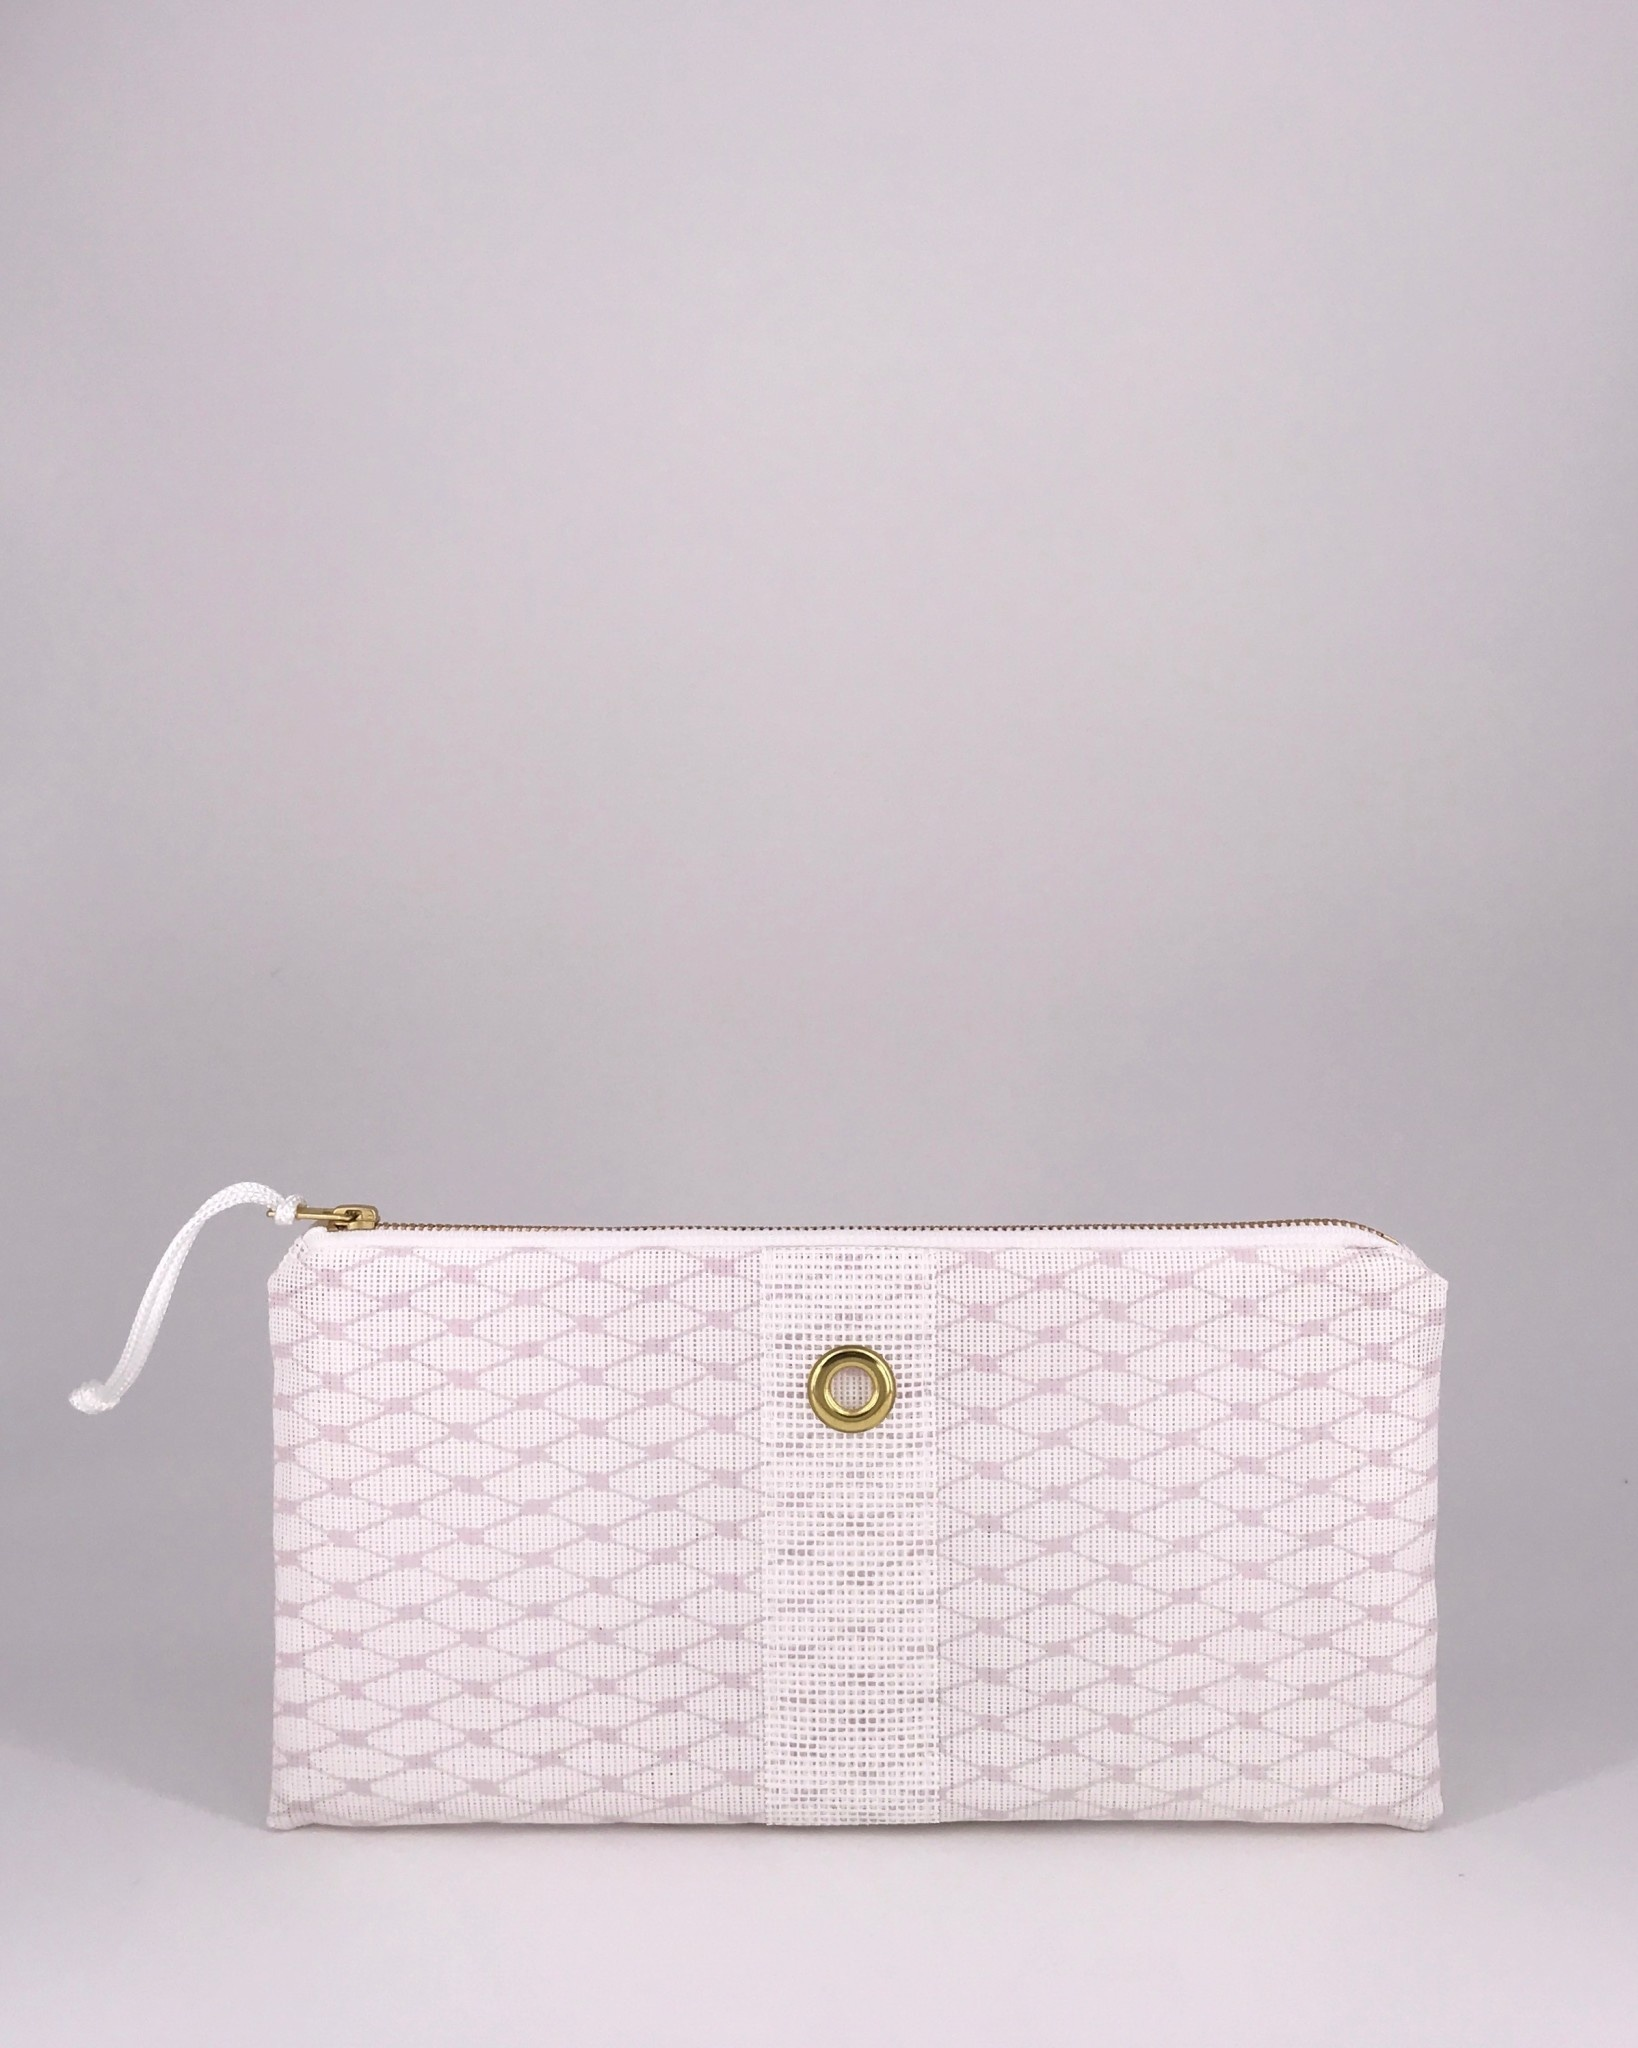 Alaina Marie ® Almost Mauve & White Clutch